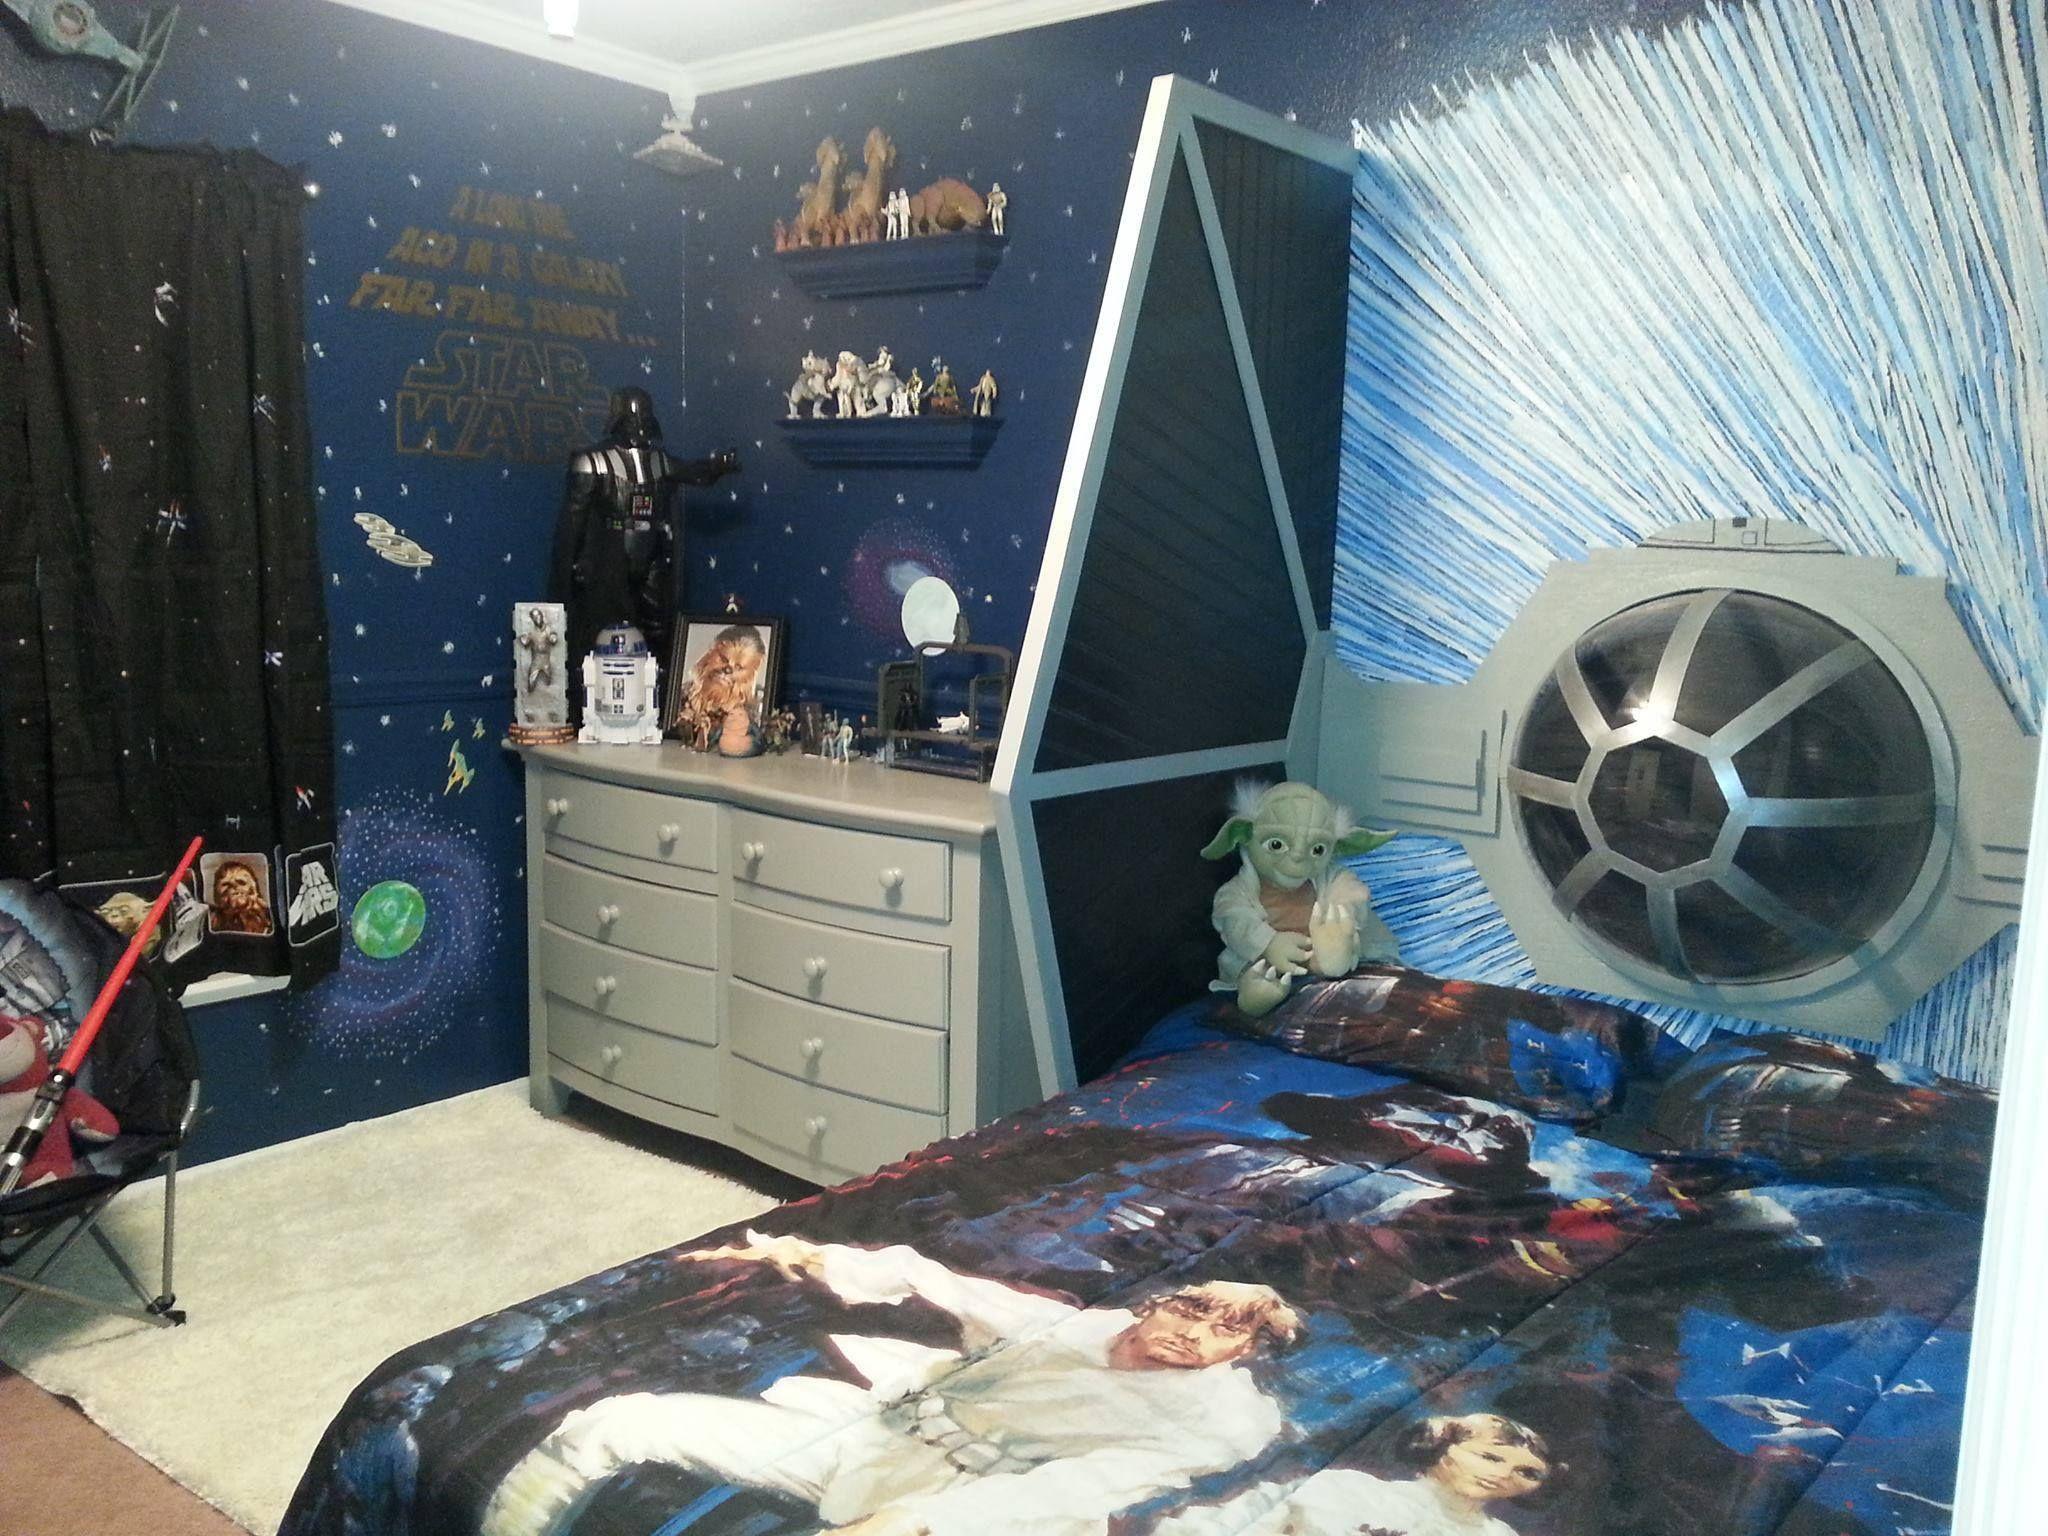 Bedroom , Star Wars Bedroom Ideas For Kids : Star Wars Bedroom Ideas  Wallpaper And Toys And Bedding And Amazing Plane Headboard